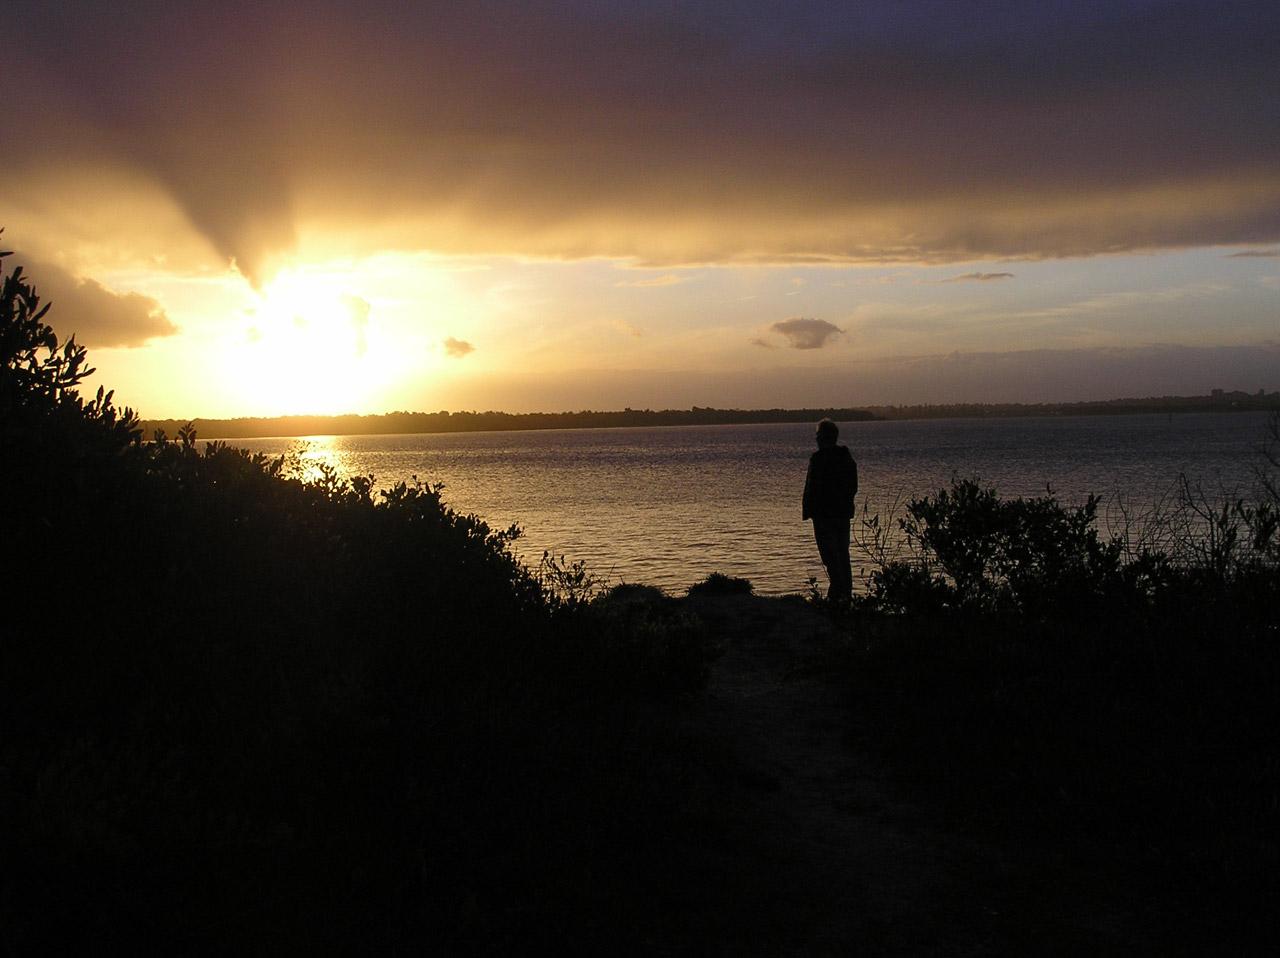 Man On Beach At Sunset Free Stock Photo Public Domain